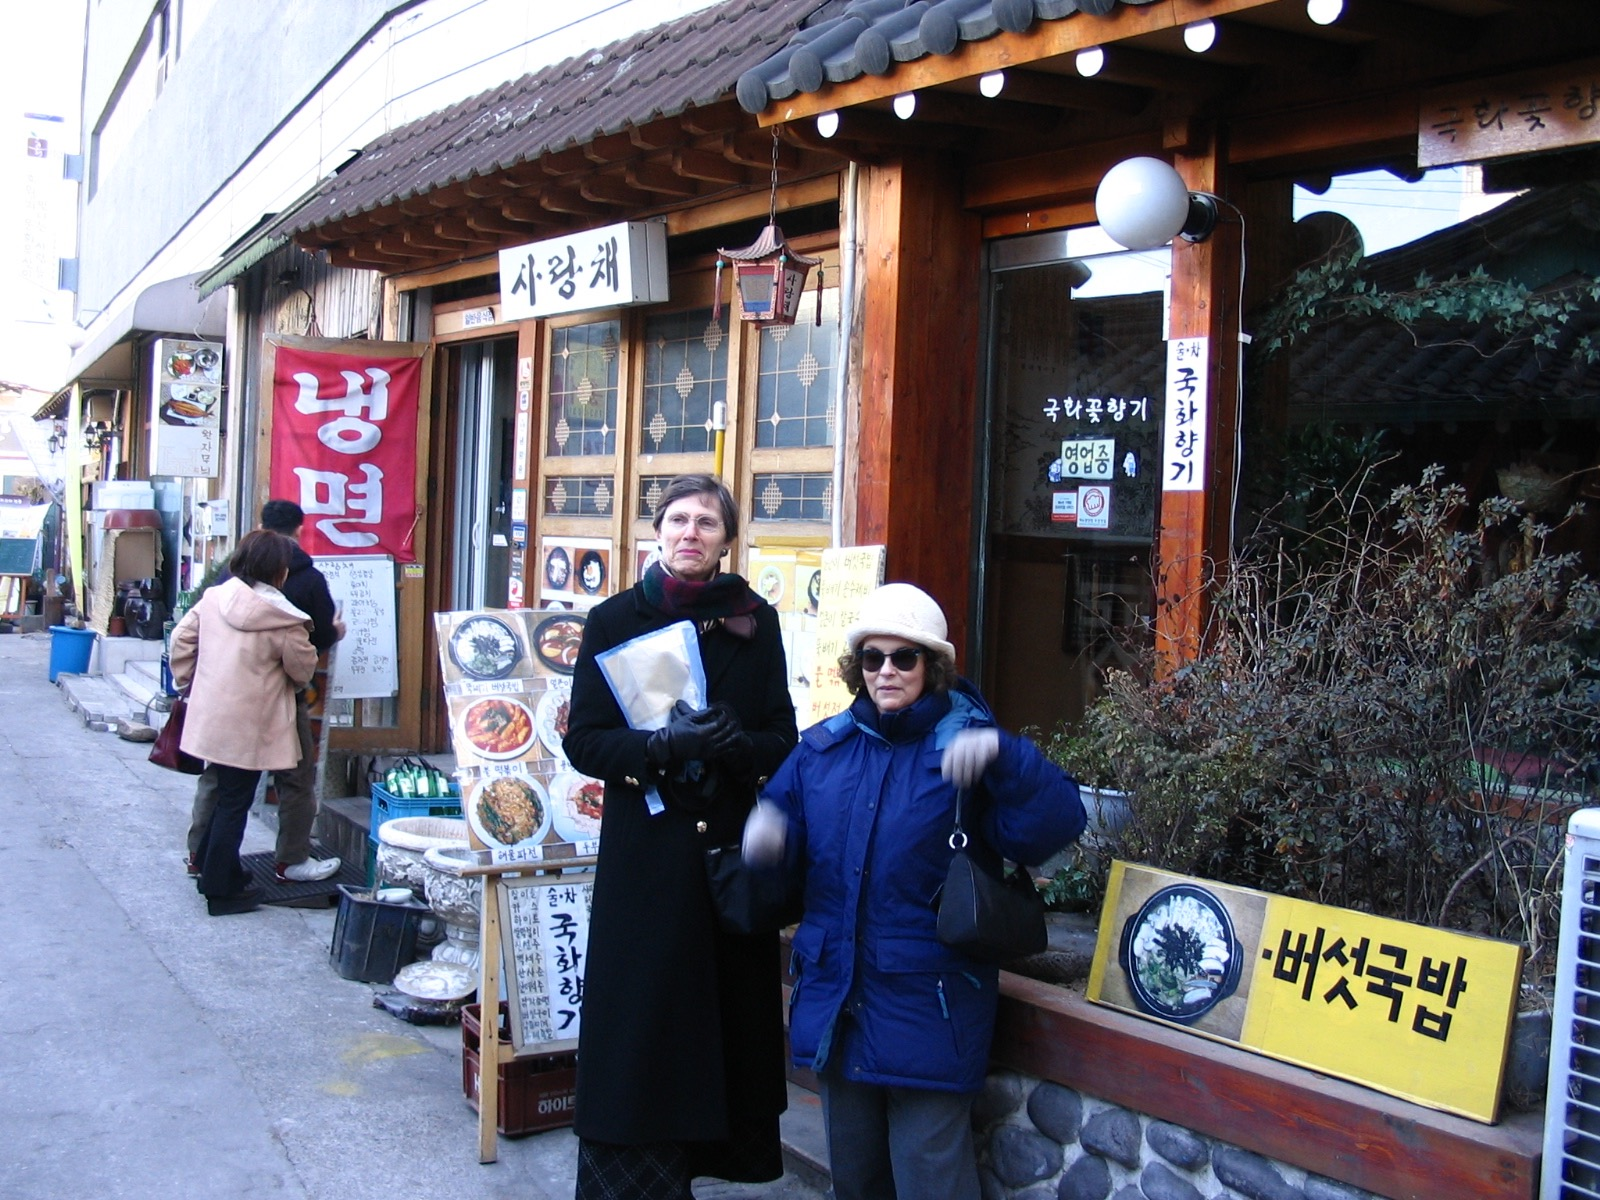 South Korea in February - 25 degrees Fahrenheit.